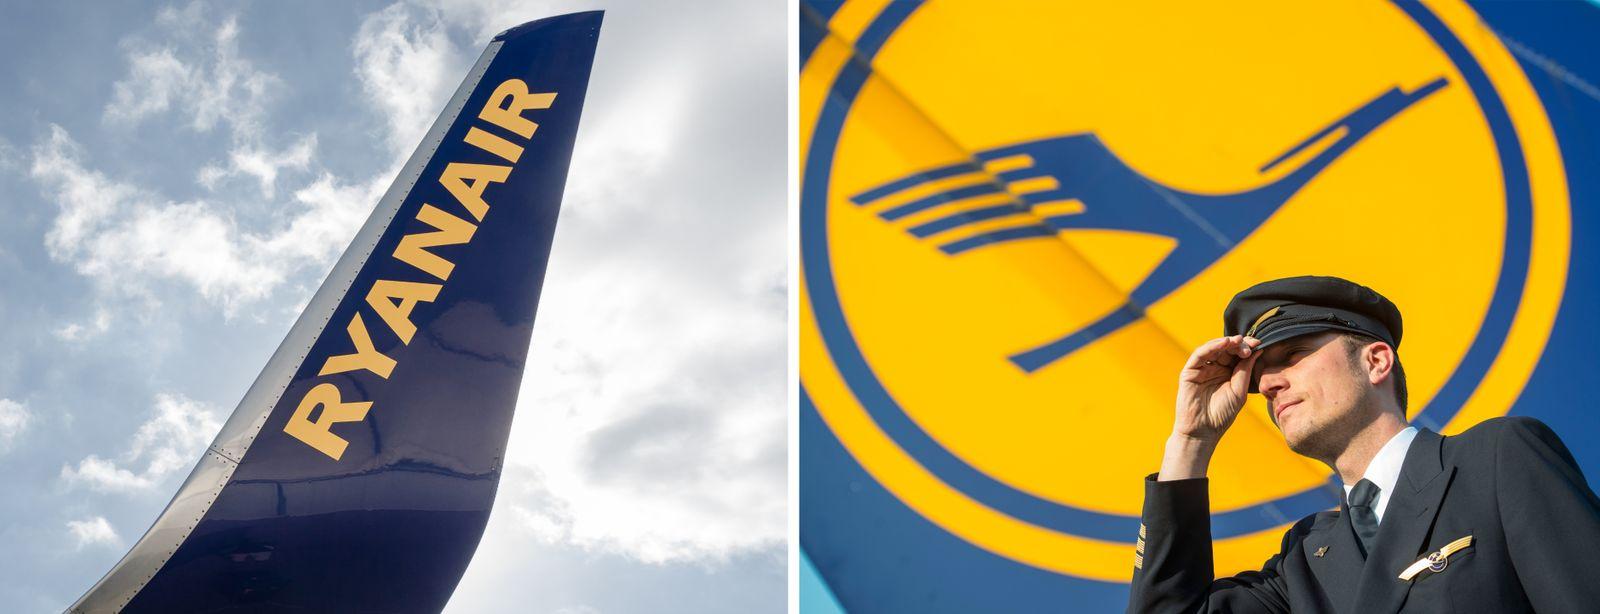 KOMBO Ryanair / Lufthansa